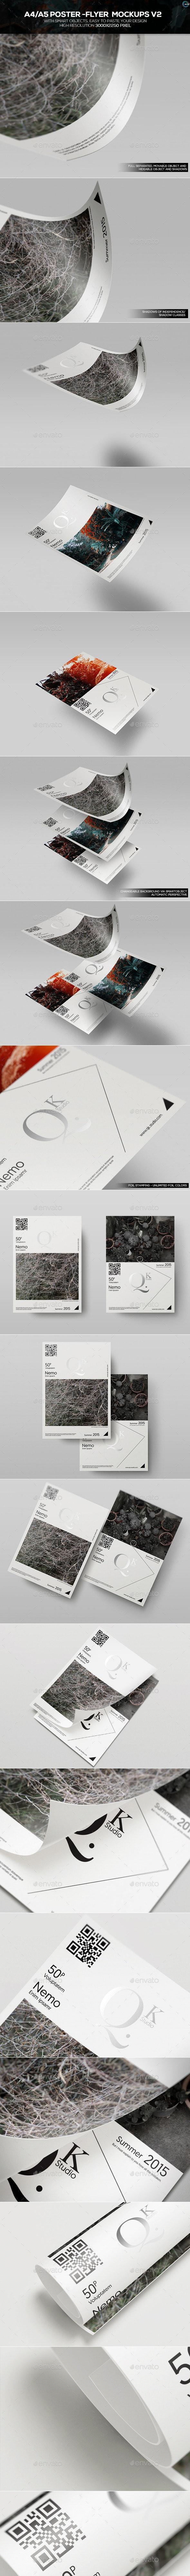 A4/A5 Poster-Flyer Mockups V2 - Flyers Print